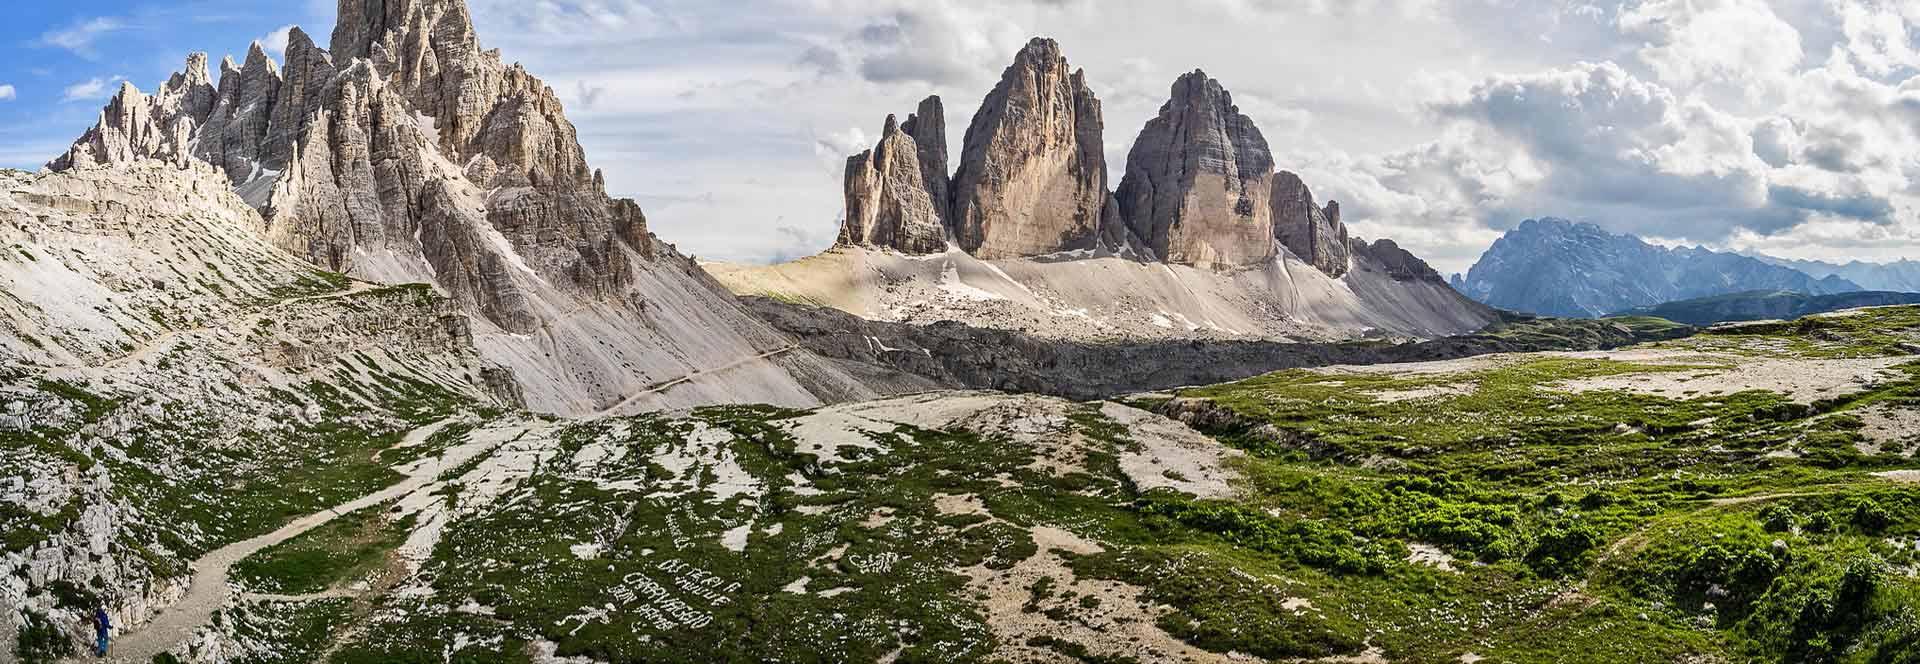 Dolomites vacations. Vacations & vacations in Dolomites in ...